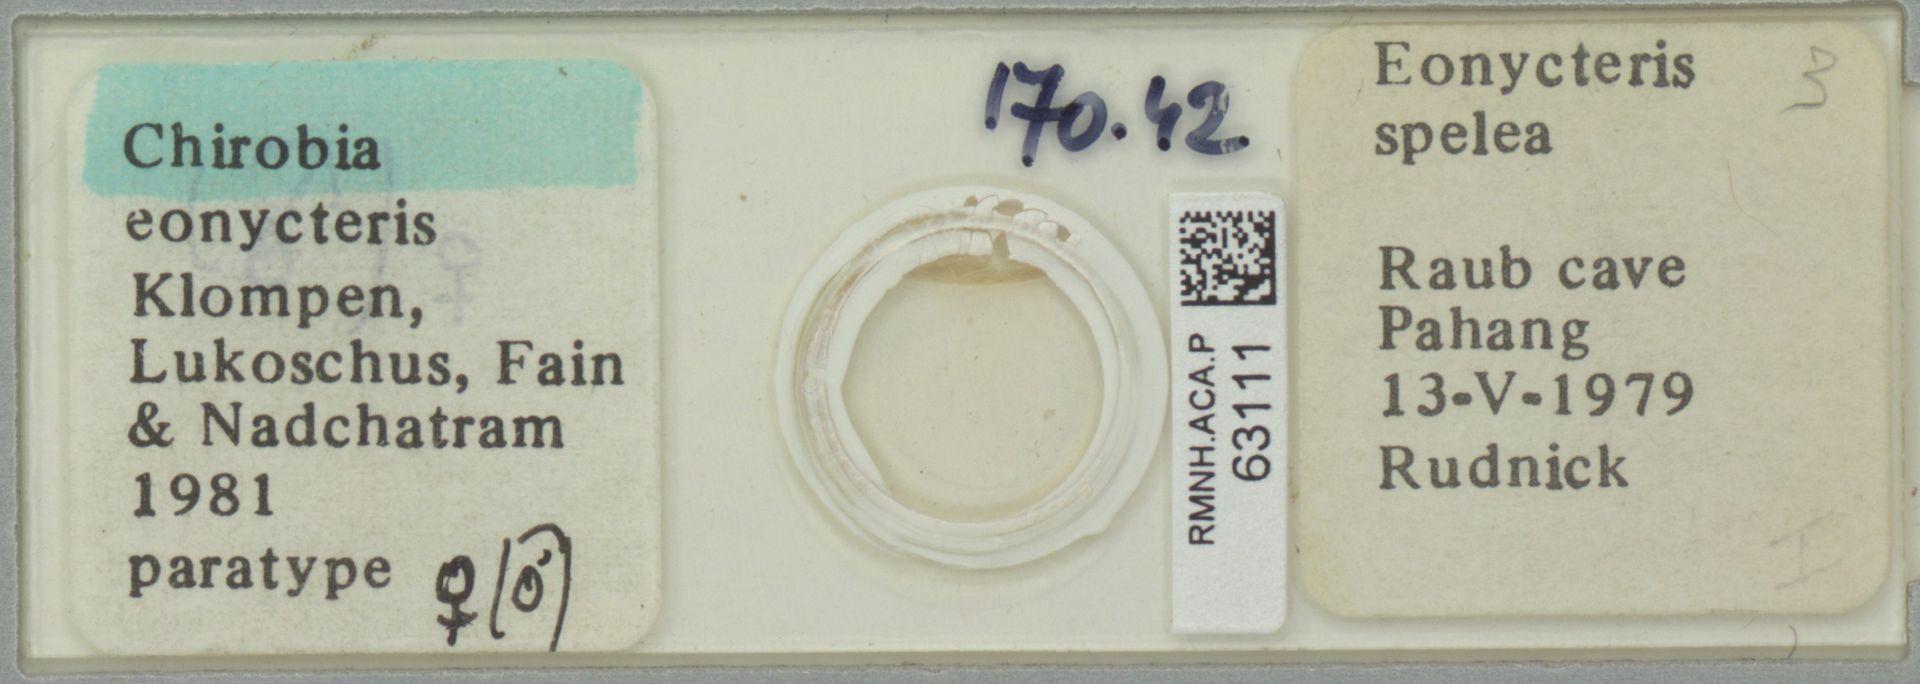 RMNH.ACA.P.63111 | Chirobia eonycteris Klompen, Lukoschus, Fain & Nadchatram 1981